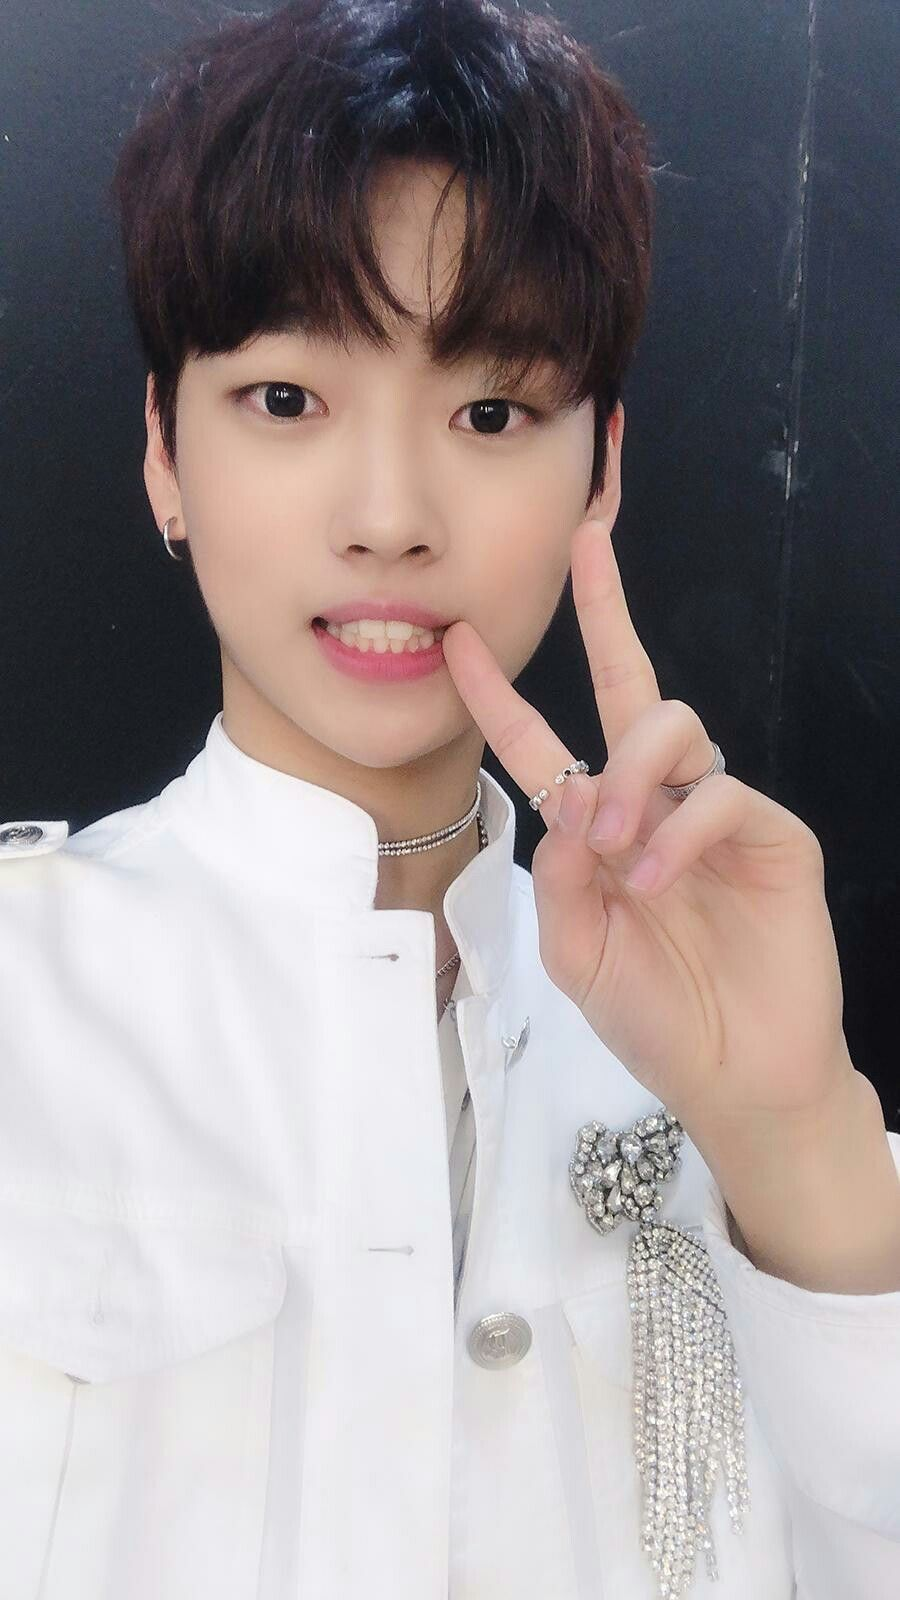 Kang Seokhwa Yg Treasure Box Semi Final Teamgrowl Ygtrainee Ygnbg Ygtreasurebox Entertainment Survival Final